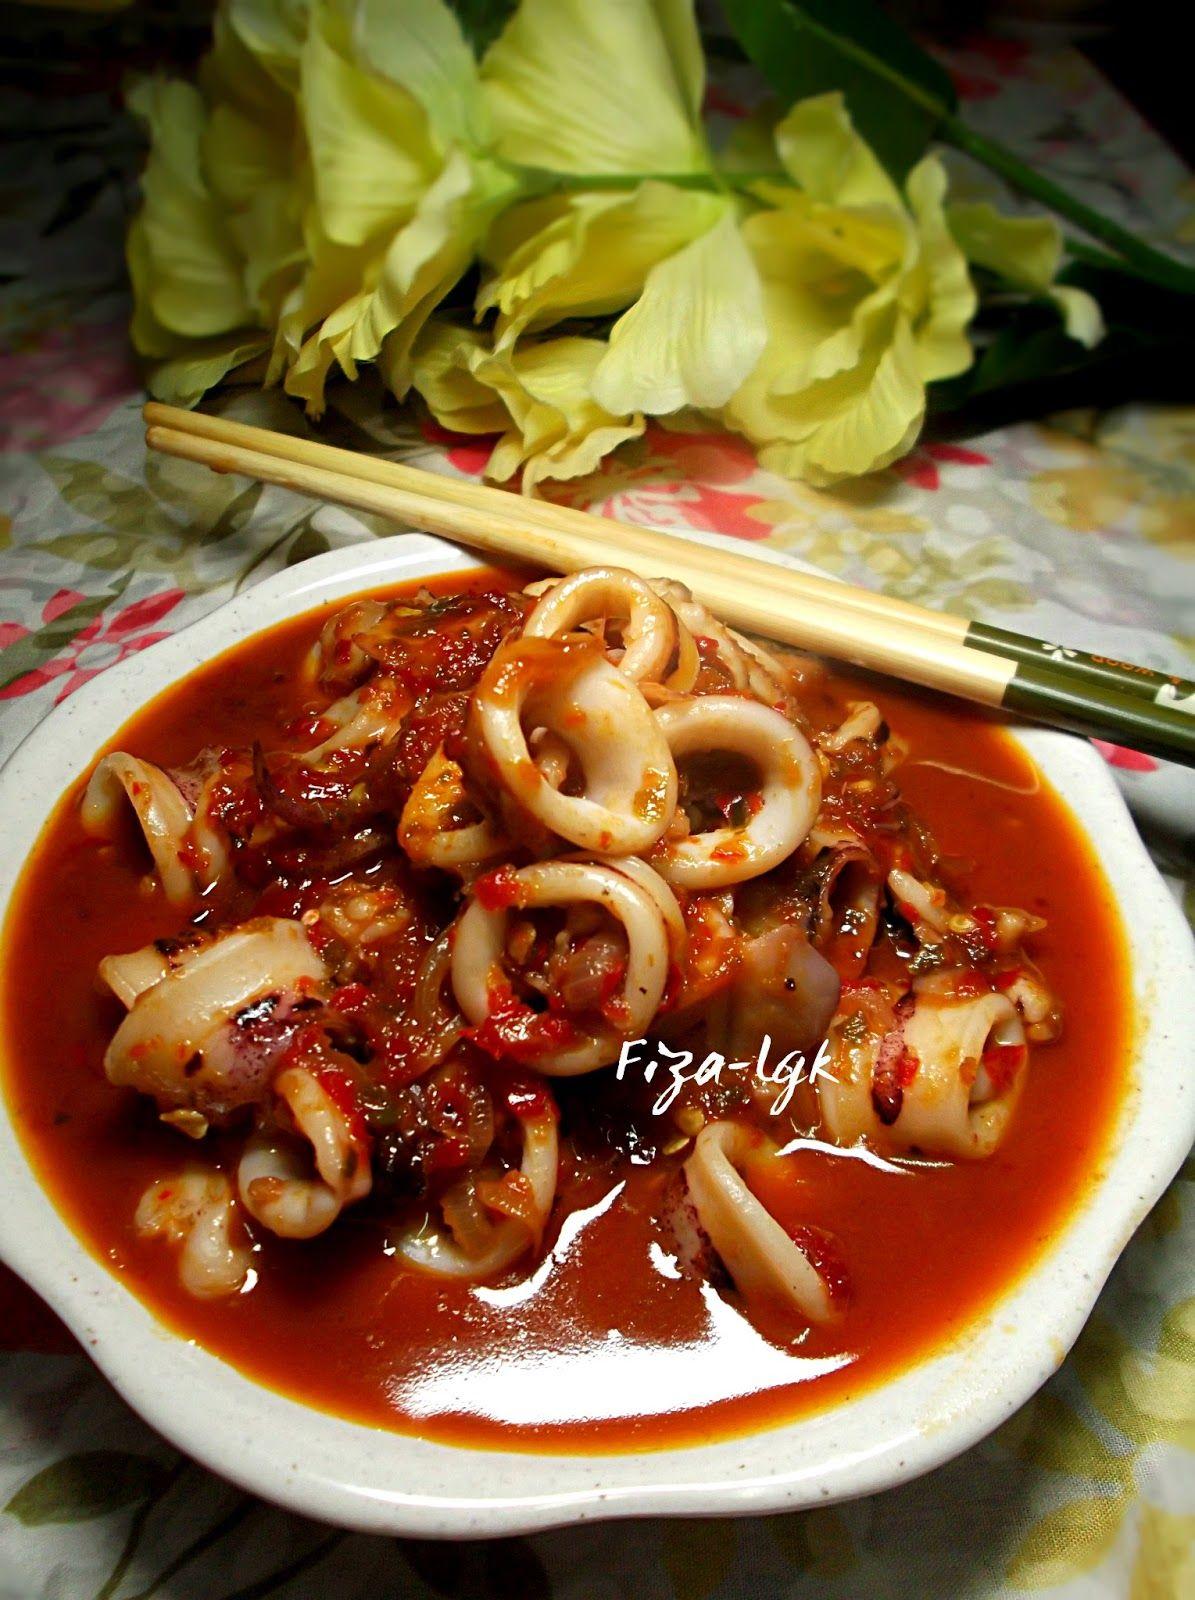 Fiza S Cooking Sambal Tumis Sotong Mudah Resep Masakan Pedas Resep Makanan Masakan Indonesia